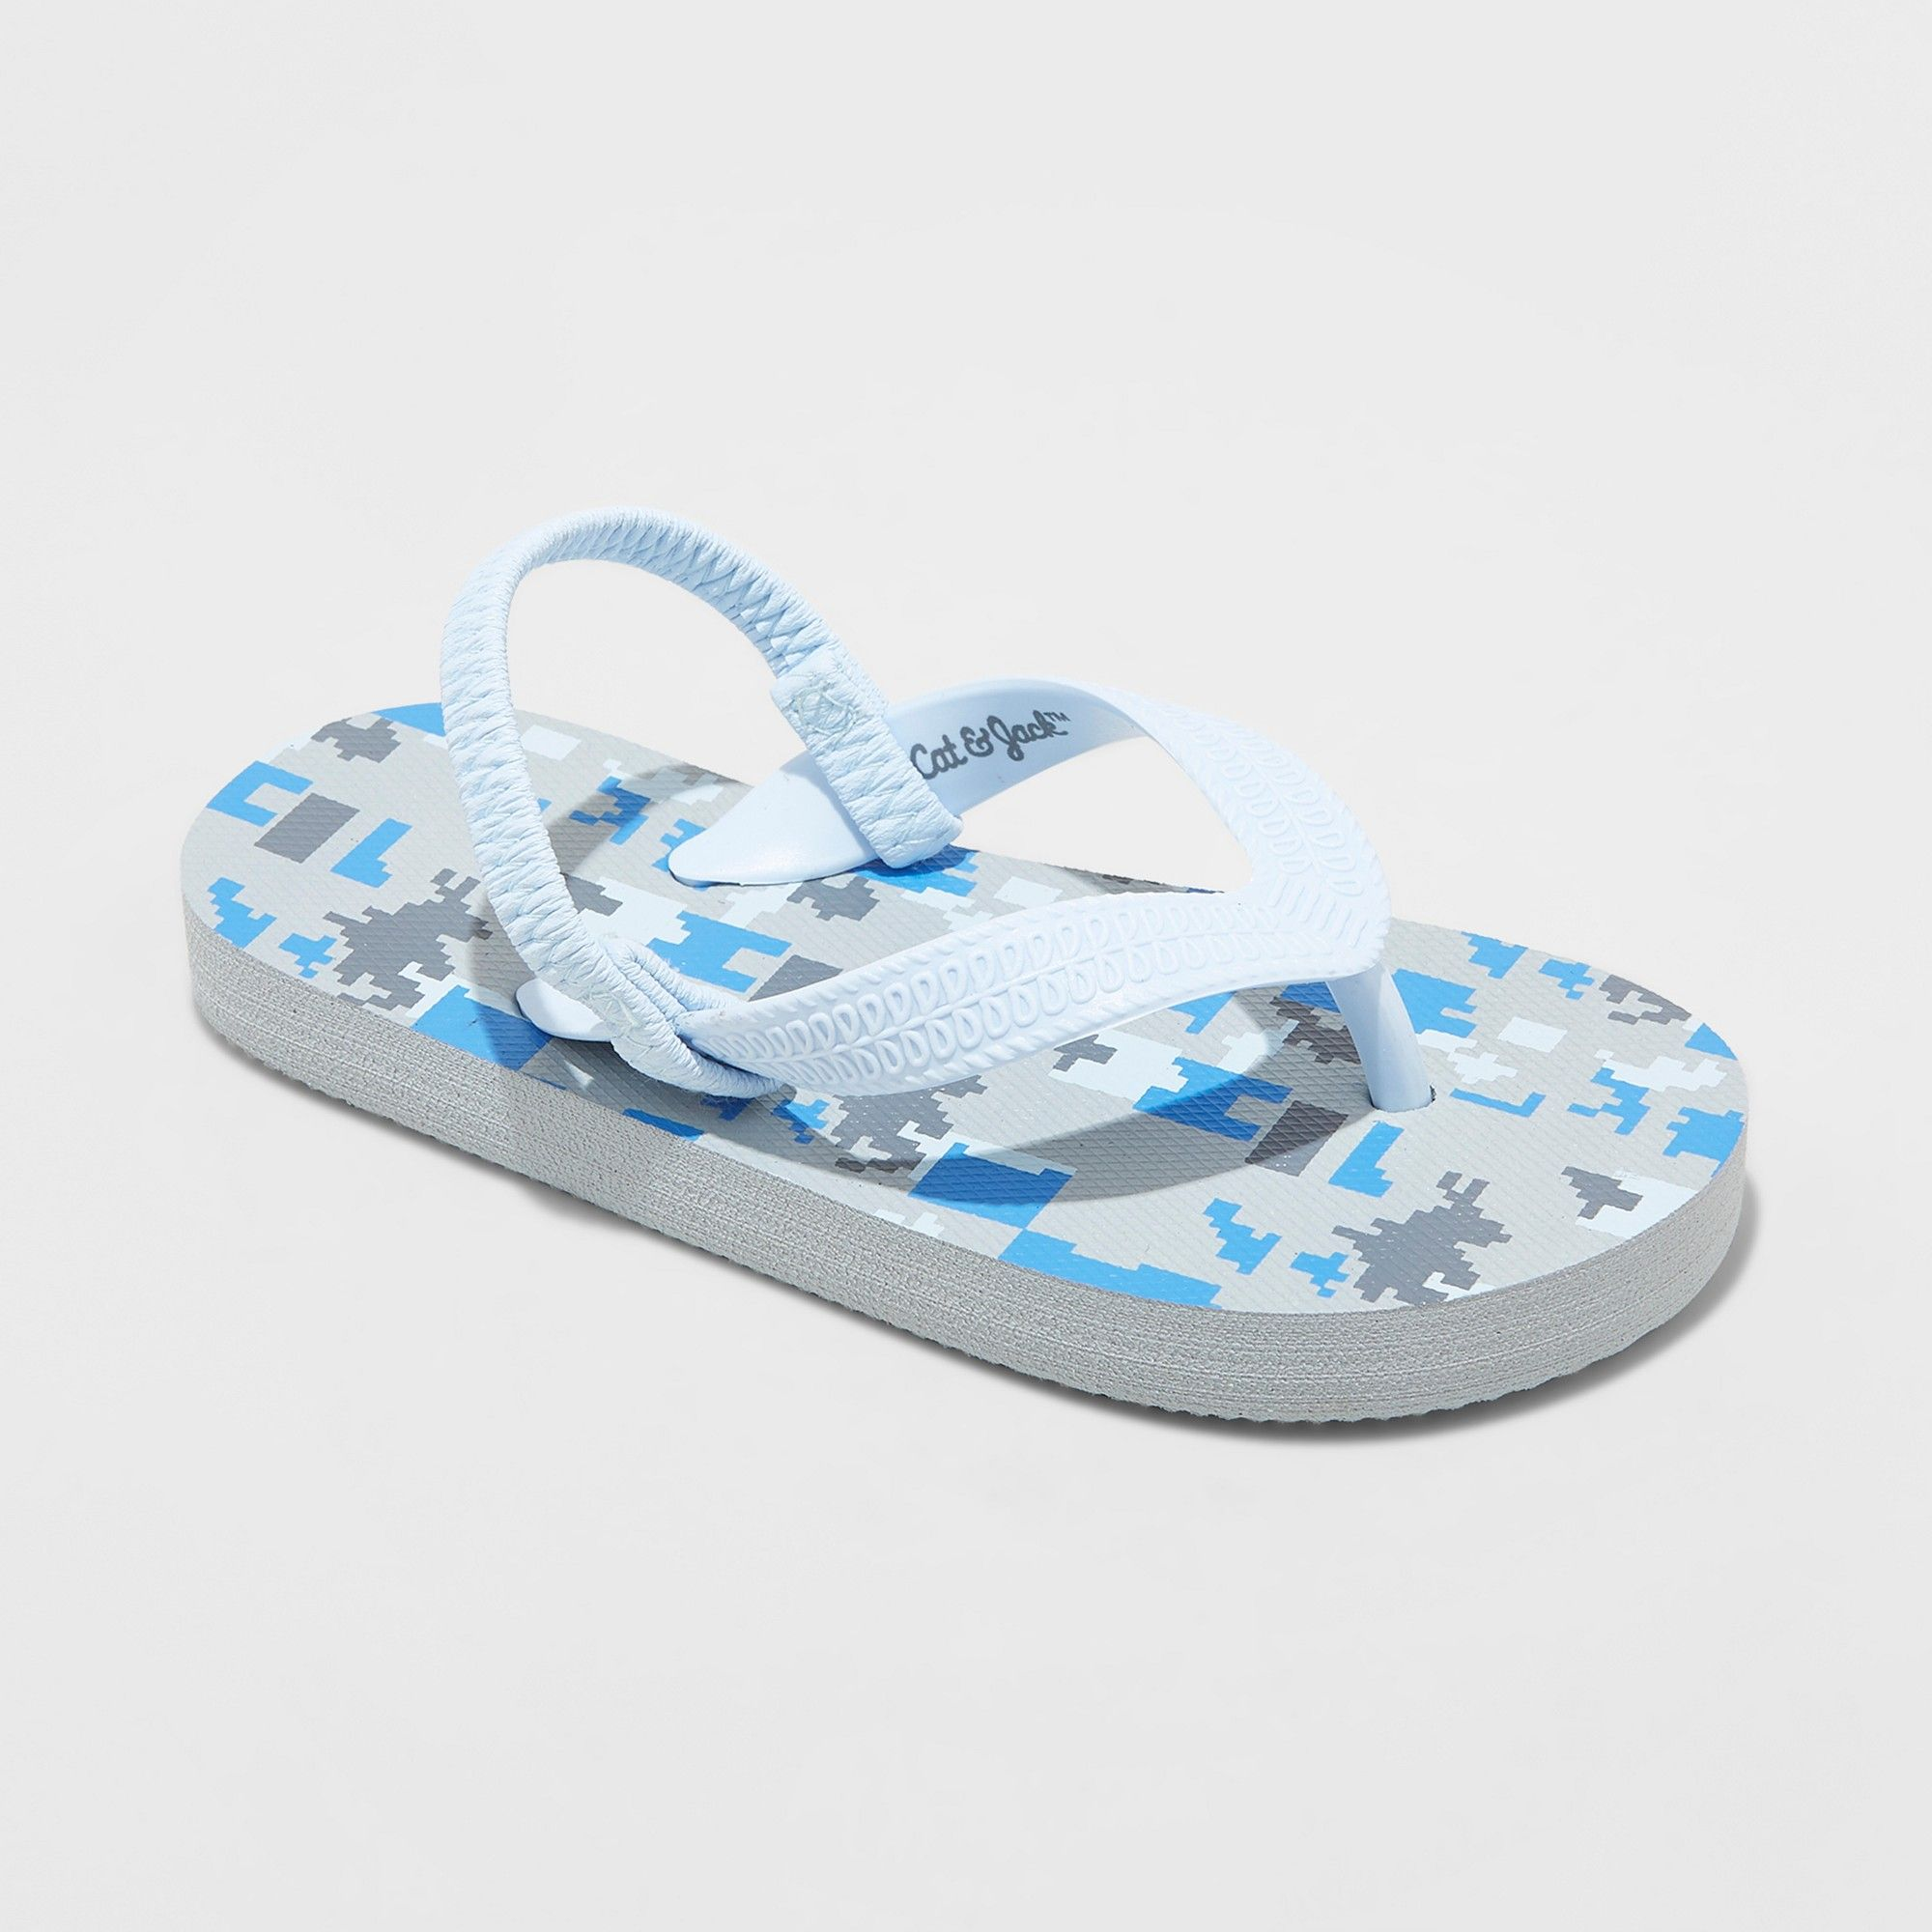 f8075edbc591 Toddler Boys' Lance Flip flop sandals - Cat & Jack Light Blue XL ...